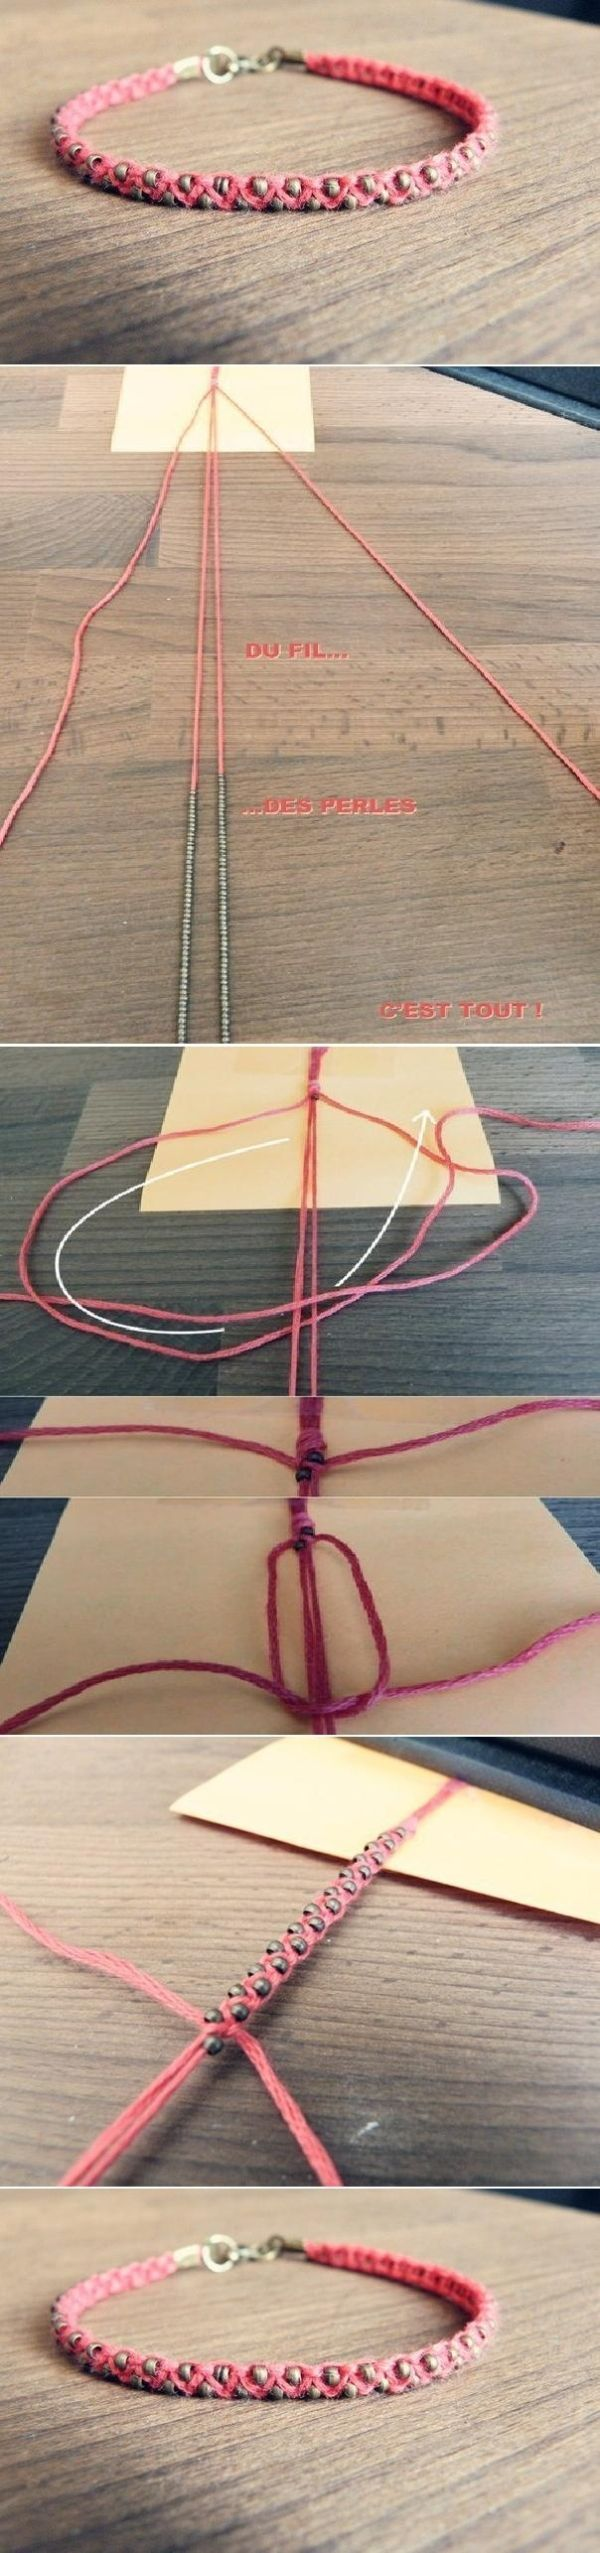 DIY Just a Weave Bracelet  . . . .   ღTrish W ~ http://www.pinterest.com/trishw/  . . . .  #handmade #jewelry